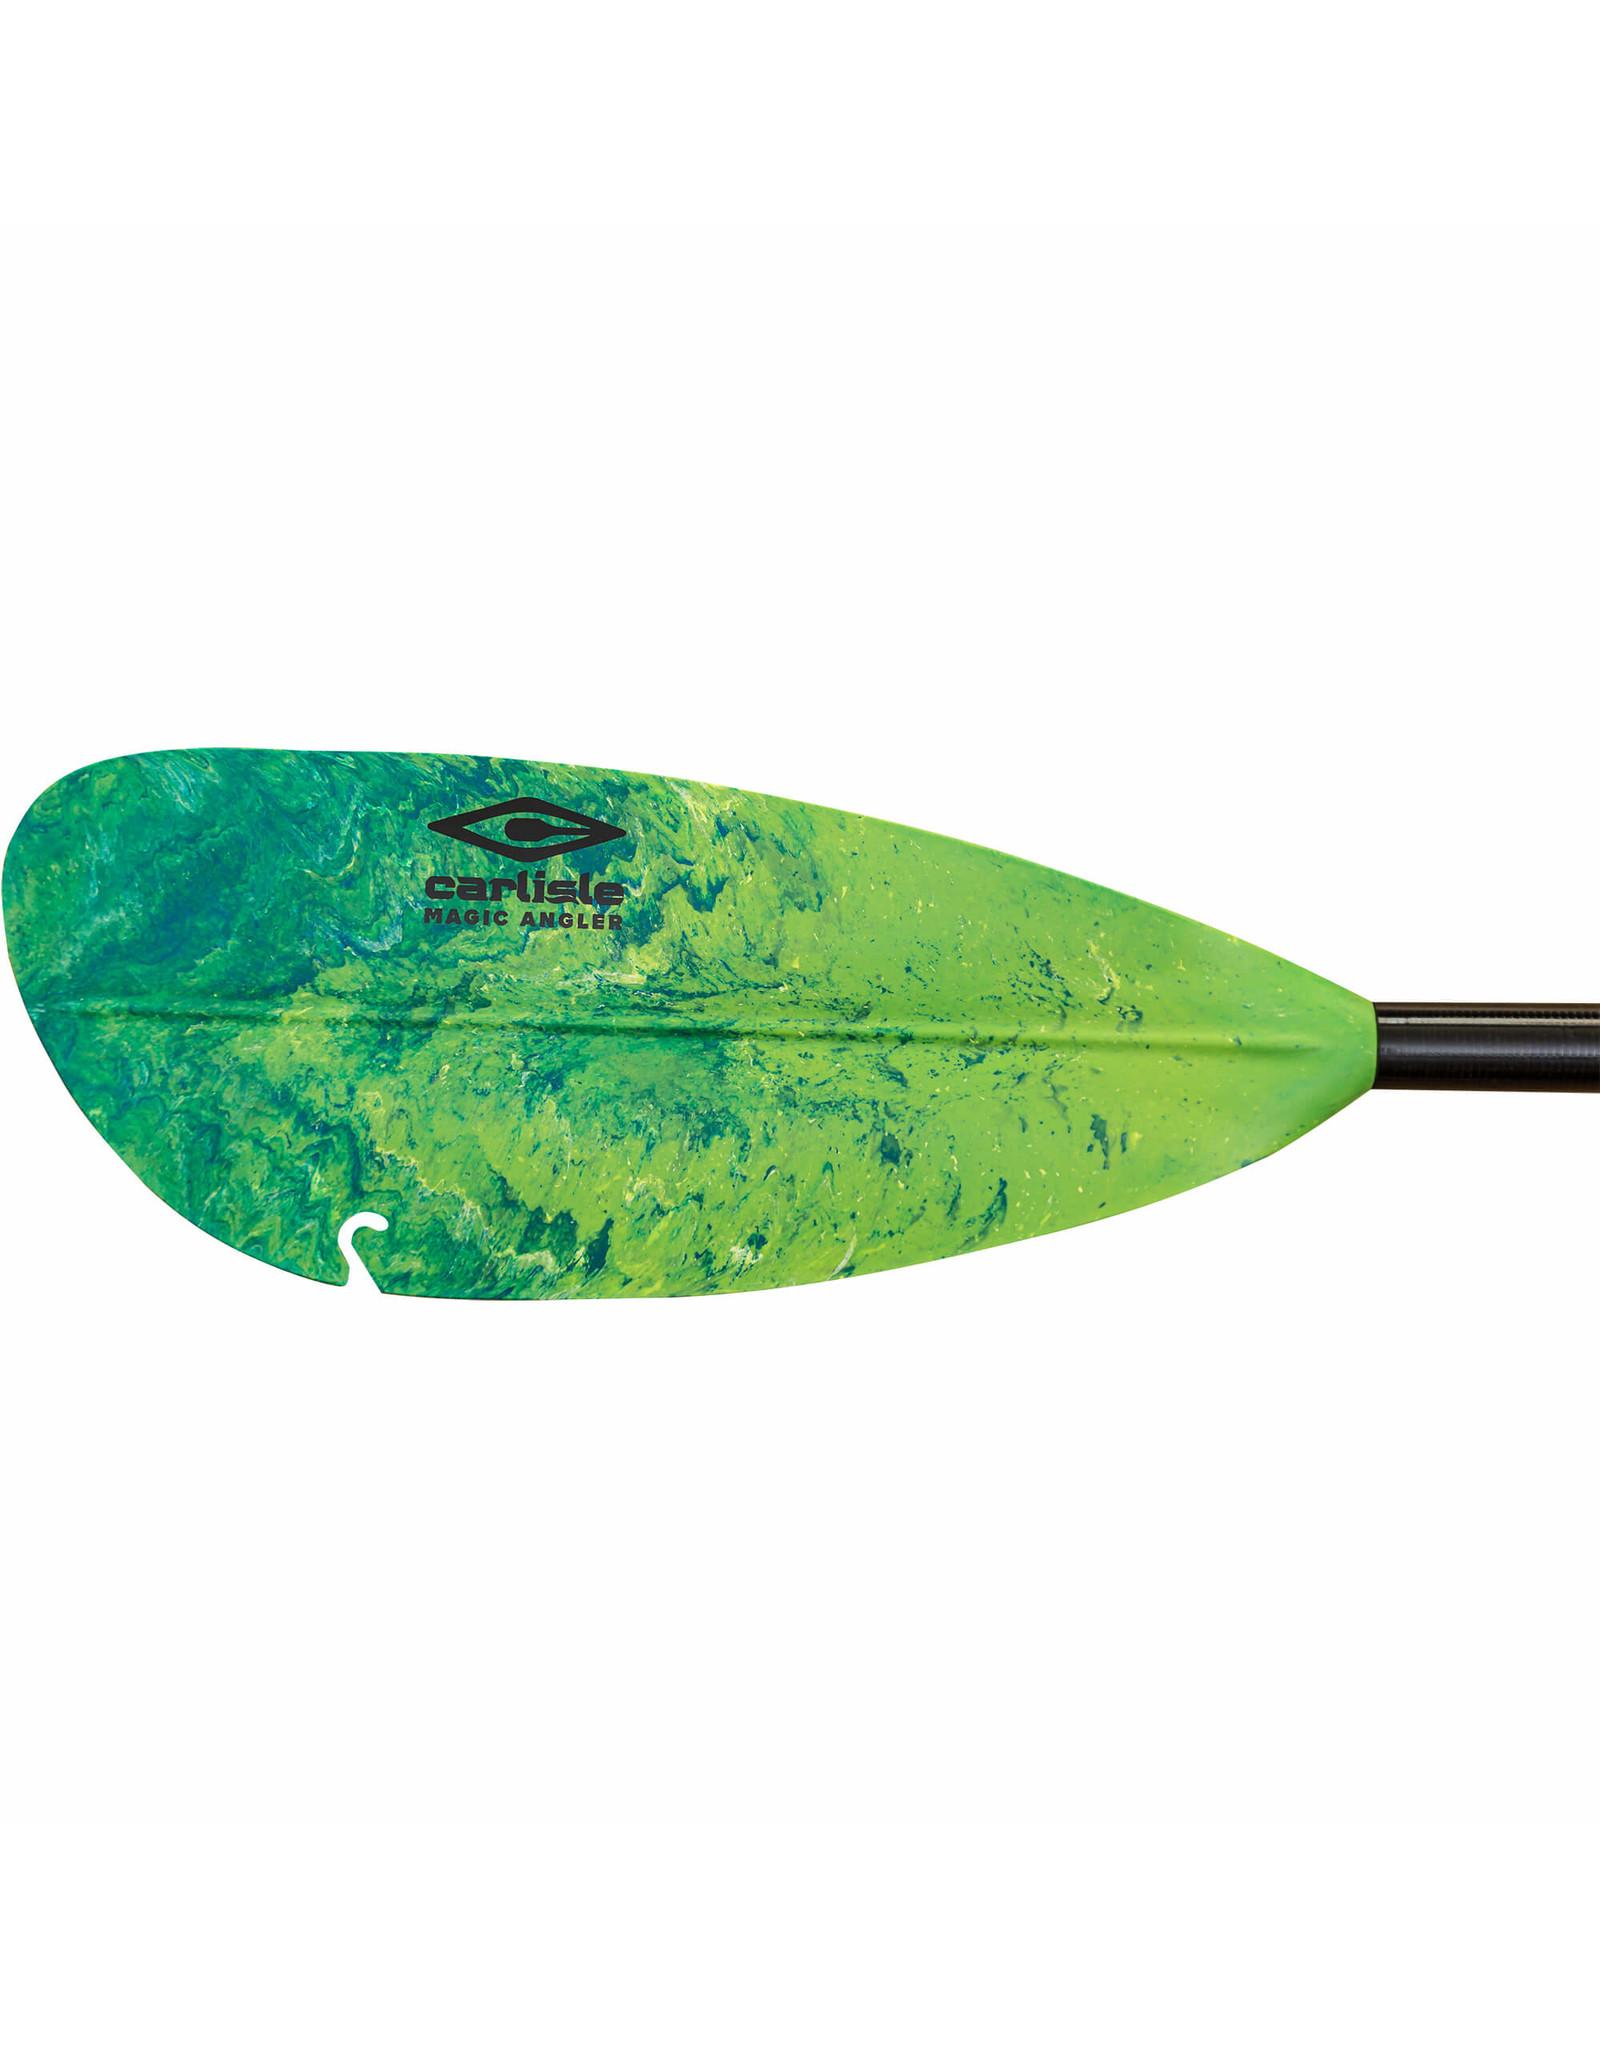 Magic Angler 240cm Ahi